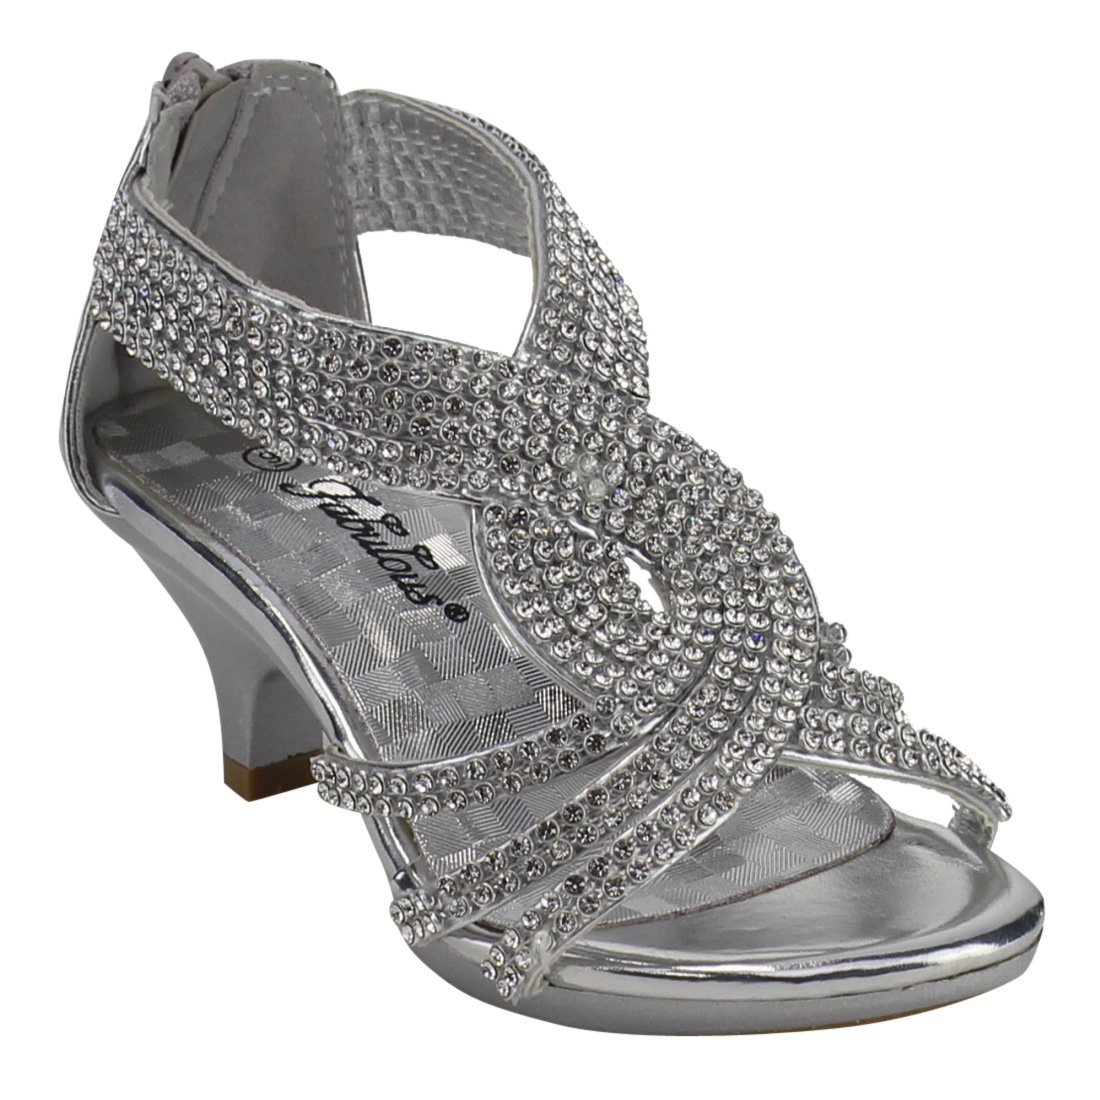 Link Angel Little Girls Rhinestone Heel Platform Dress Sandals Shoes